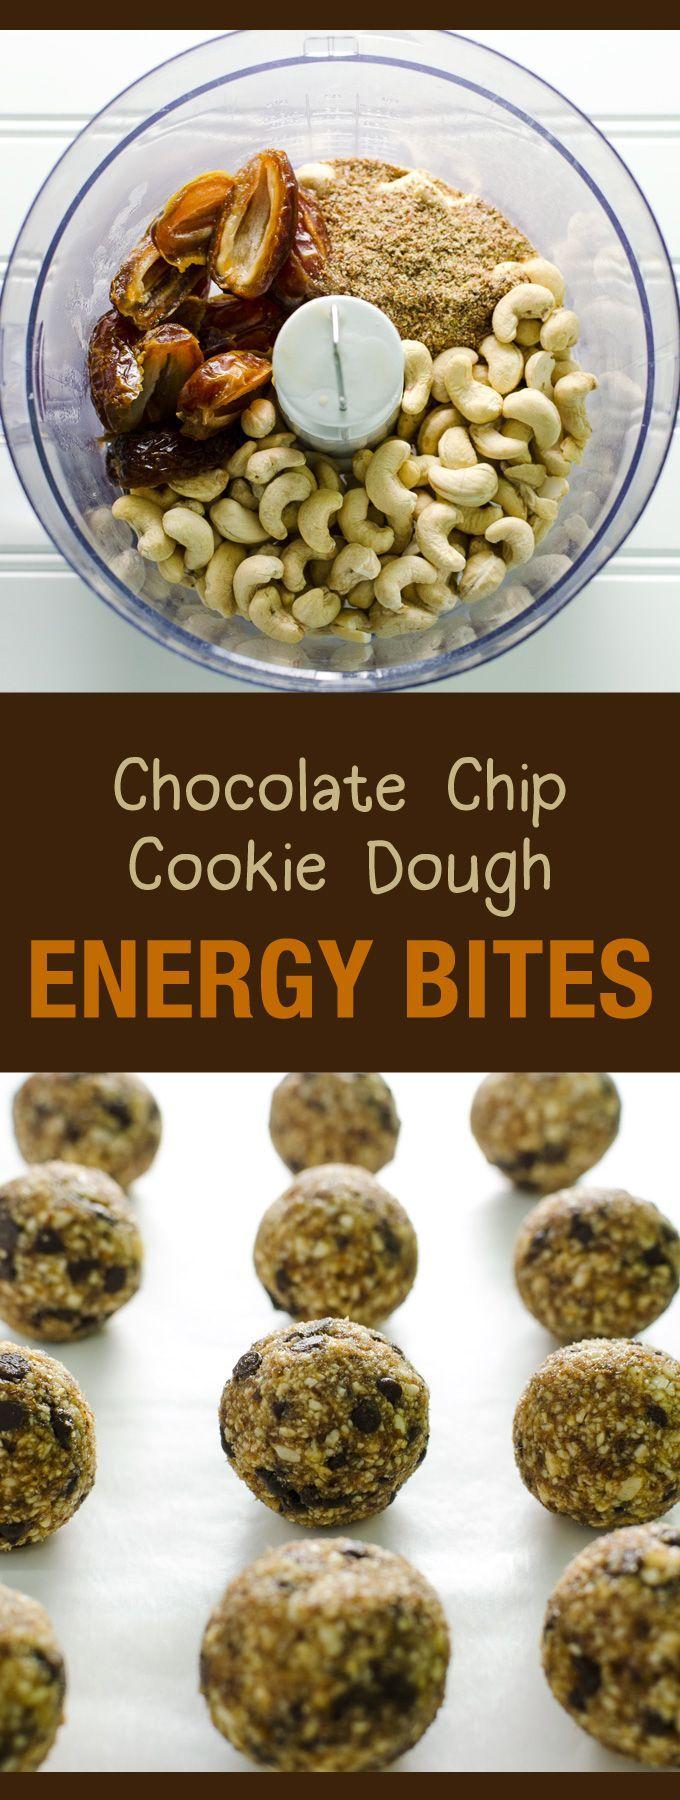 Chocolate Chip Cookie Dough Energy Bites  - a healthy snack or dessert - easy recipe - vegan and gluten free | http://VeggiePrimer.com